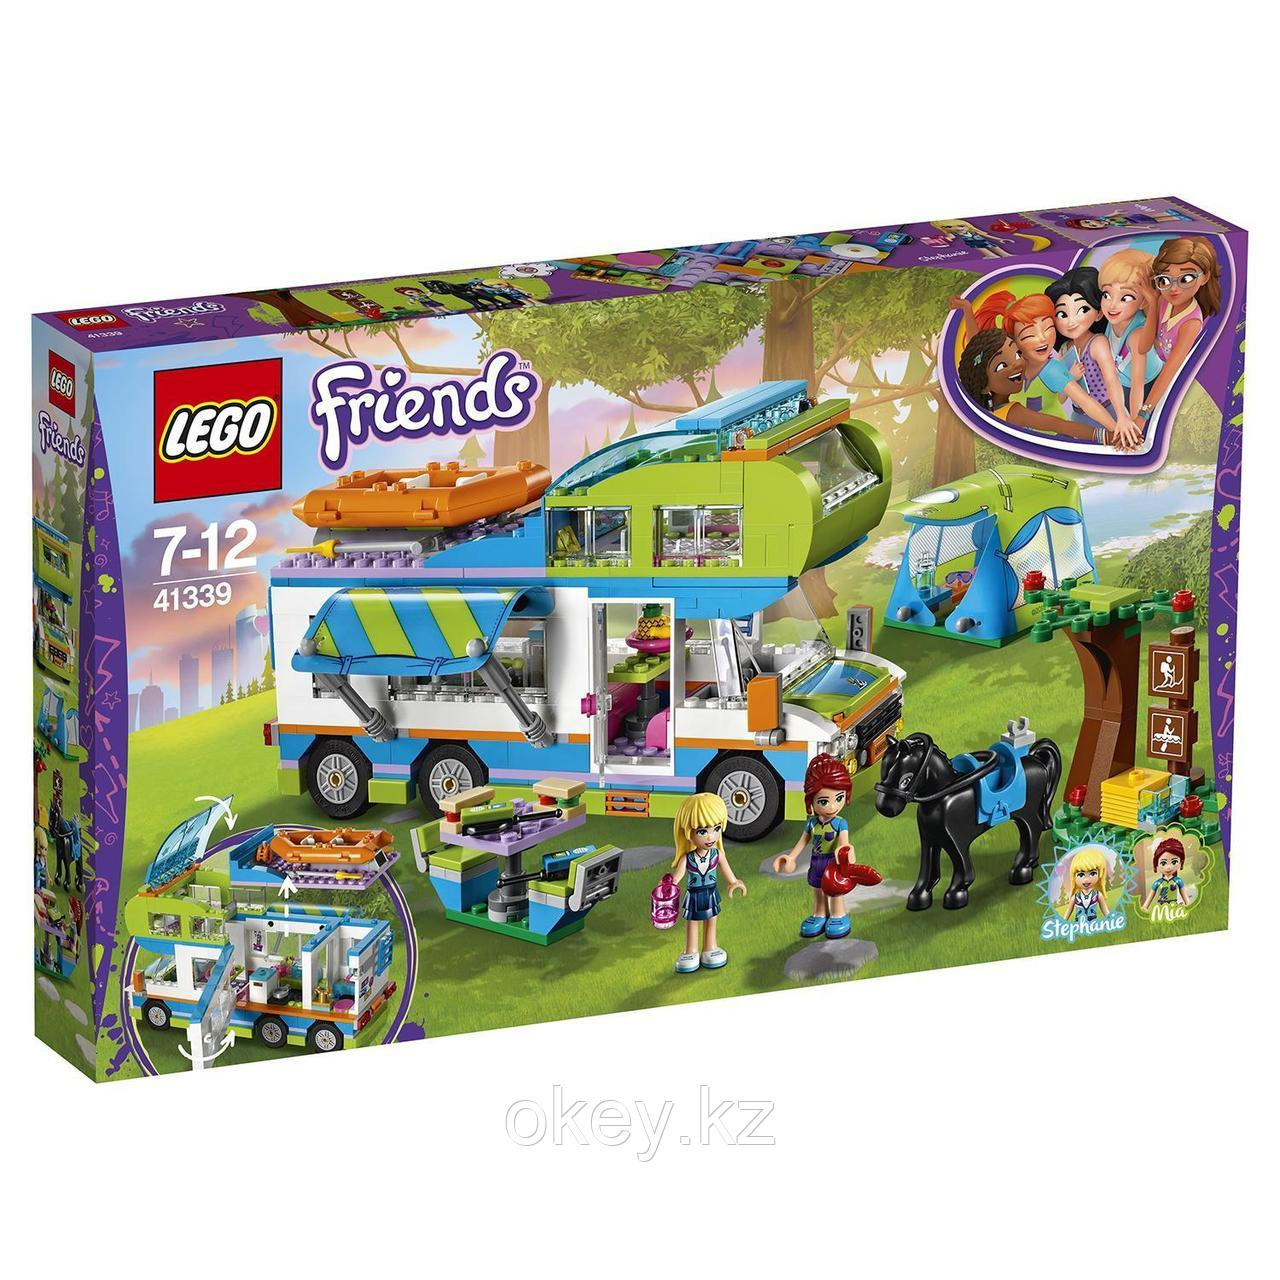 LEGO Friends: Дом на колёсах 41339